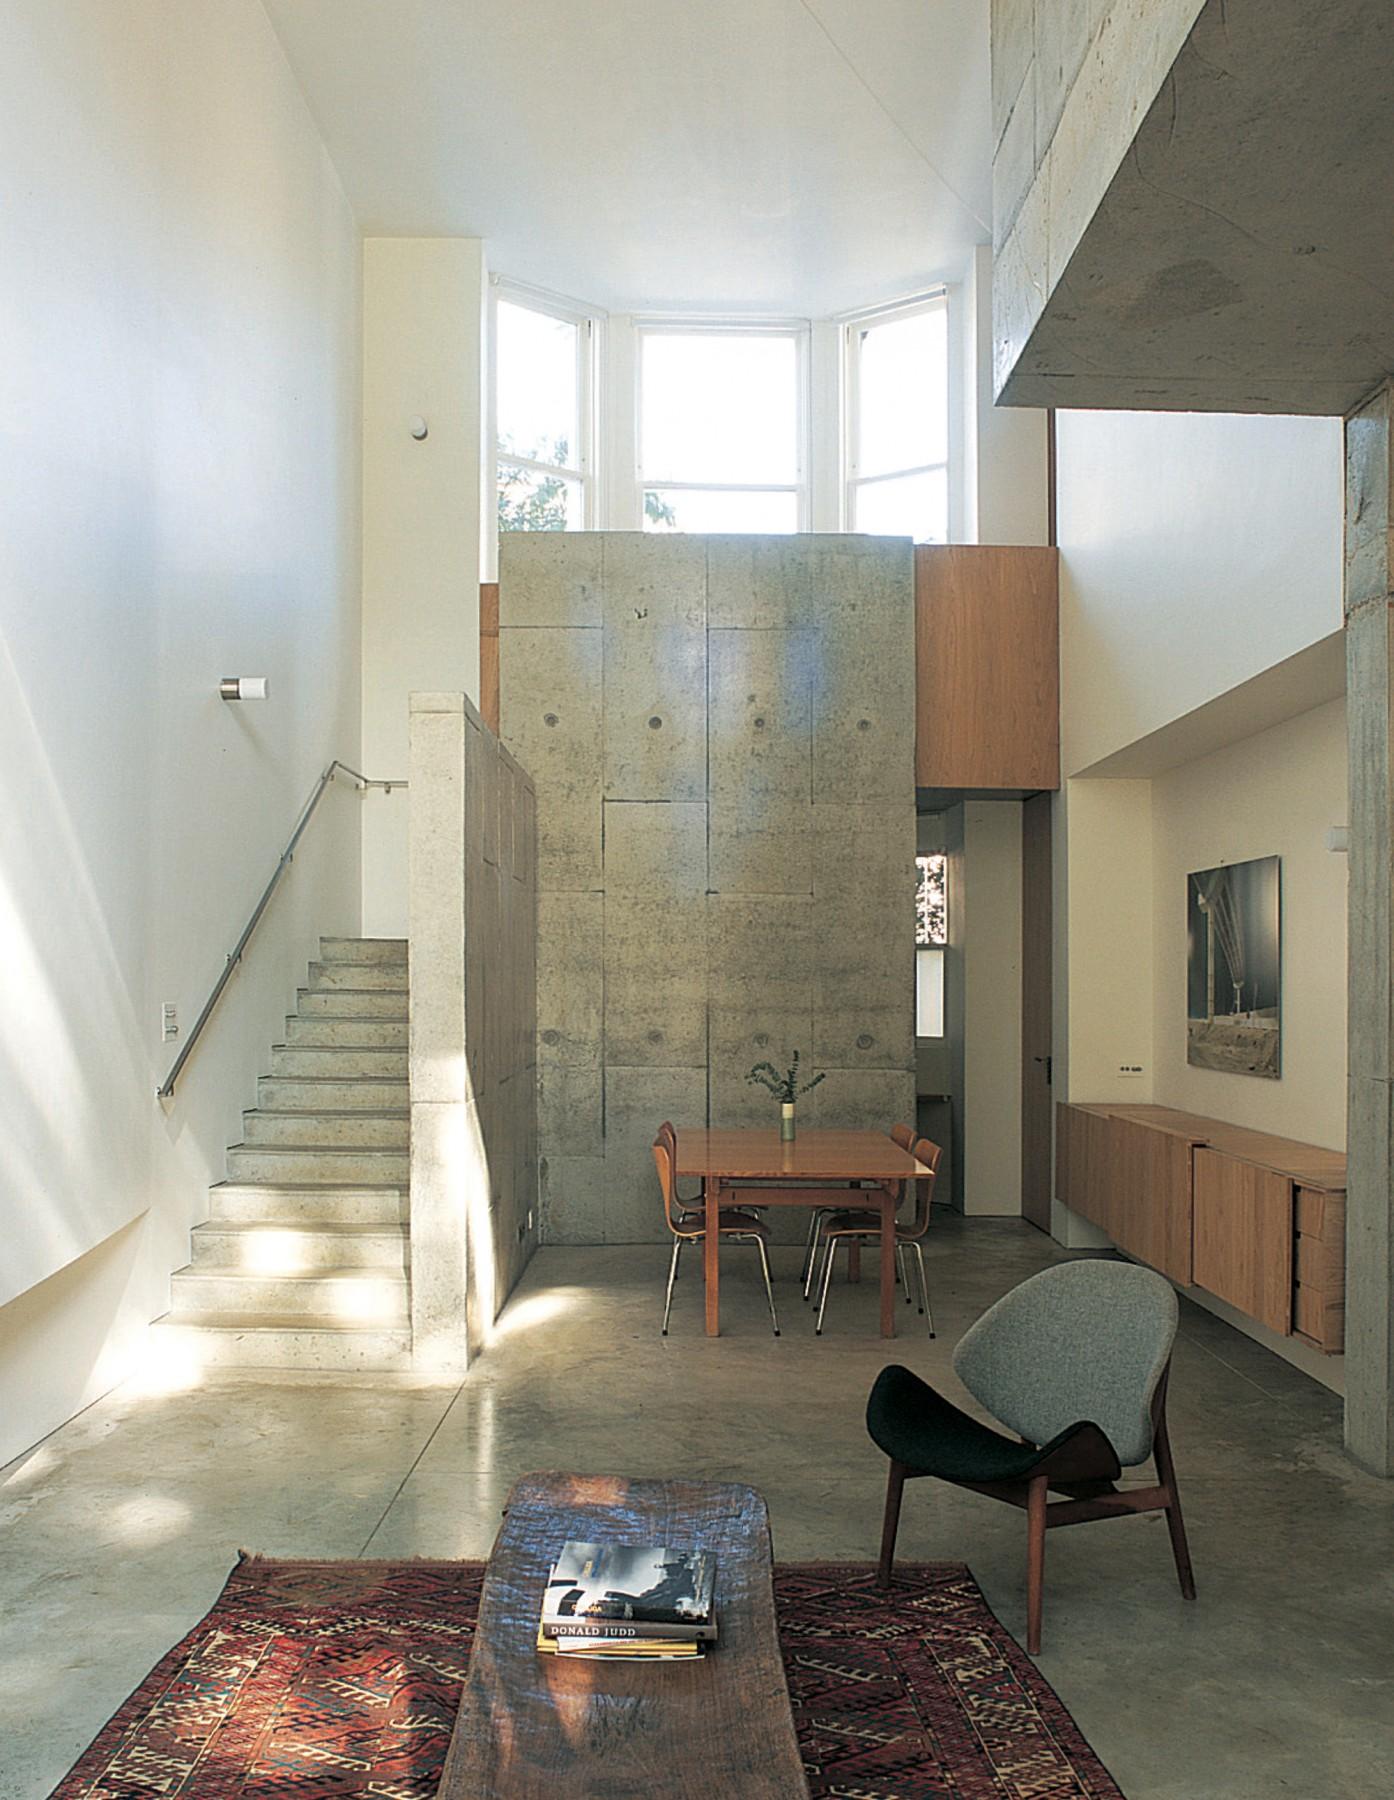 Kander-house-Primrose-hill-London-residential-home-contemporary-interior-Riba-award-victorian-Jamie-Fobert-Architects-8 rgb